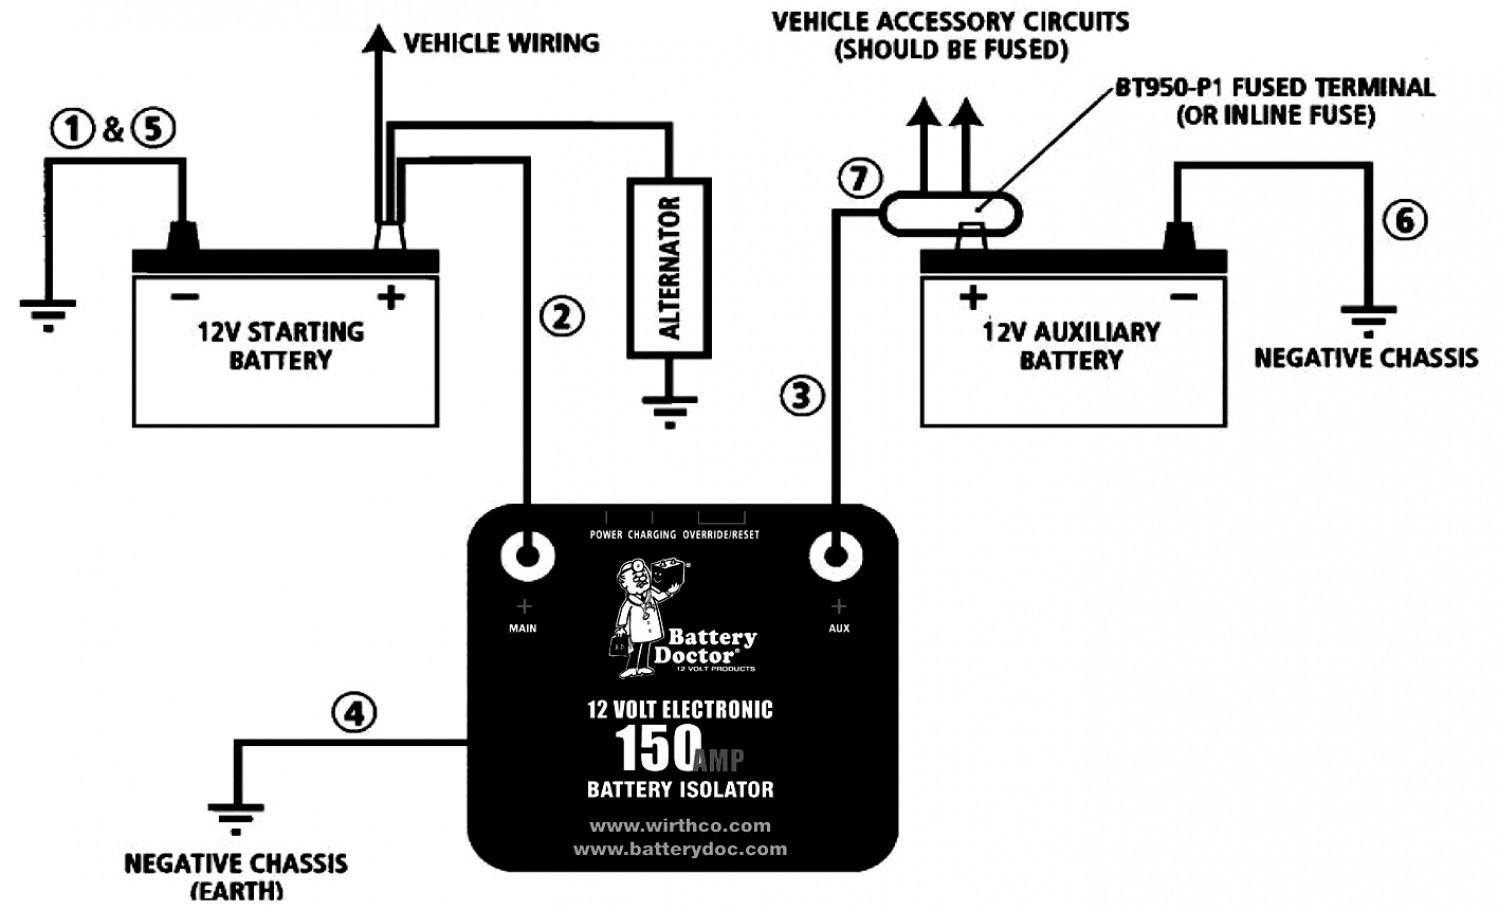 Outstanding 99 Chevy Battery Isolator Wiring General Wiring Diagram Data Wiring Cloud Venetbieswglorg